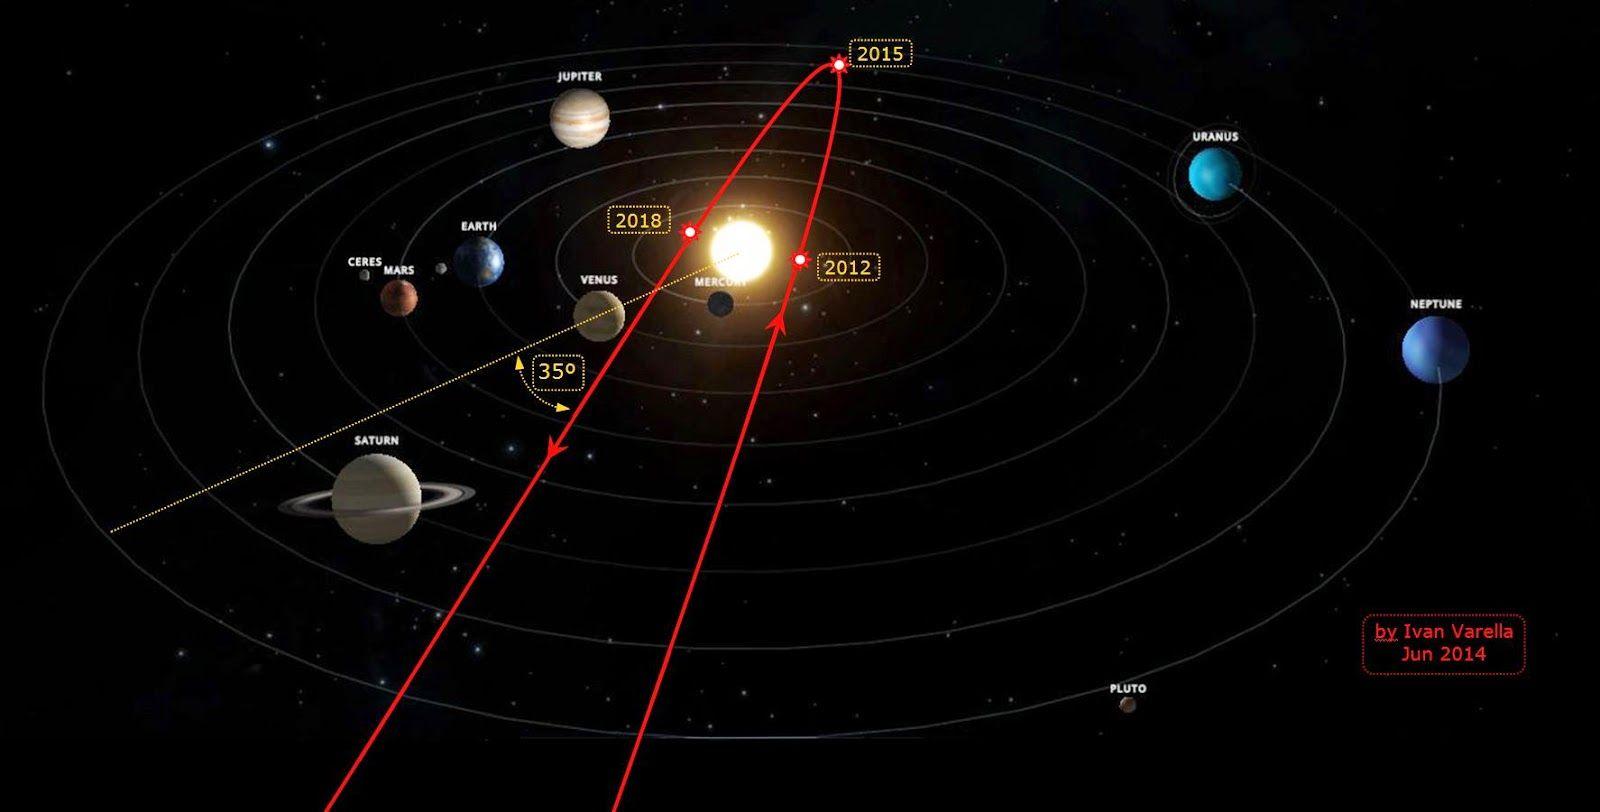 sumerian solar system map - photo #40